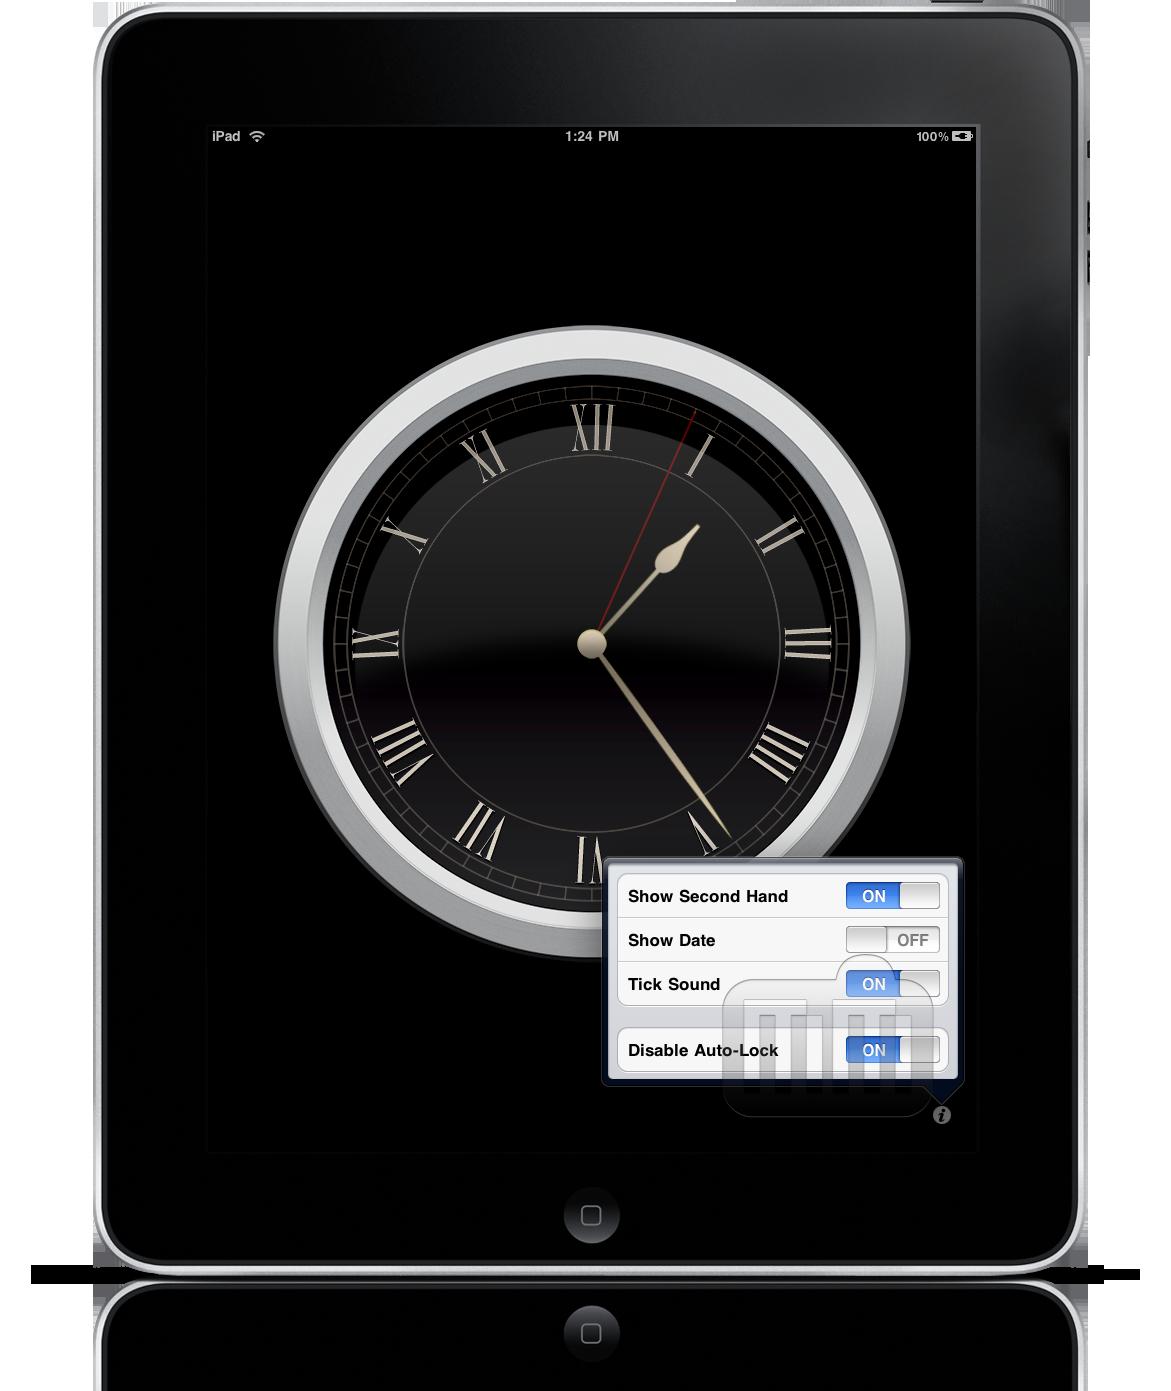 Wall Clock no iPad